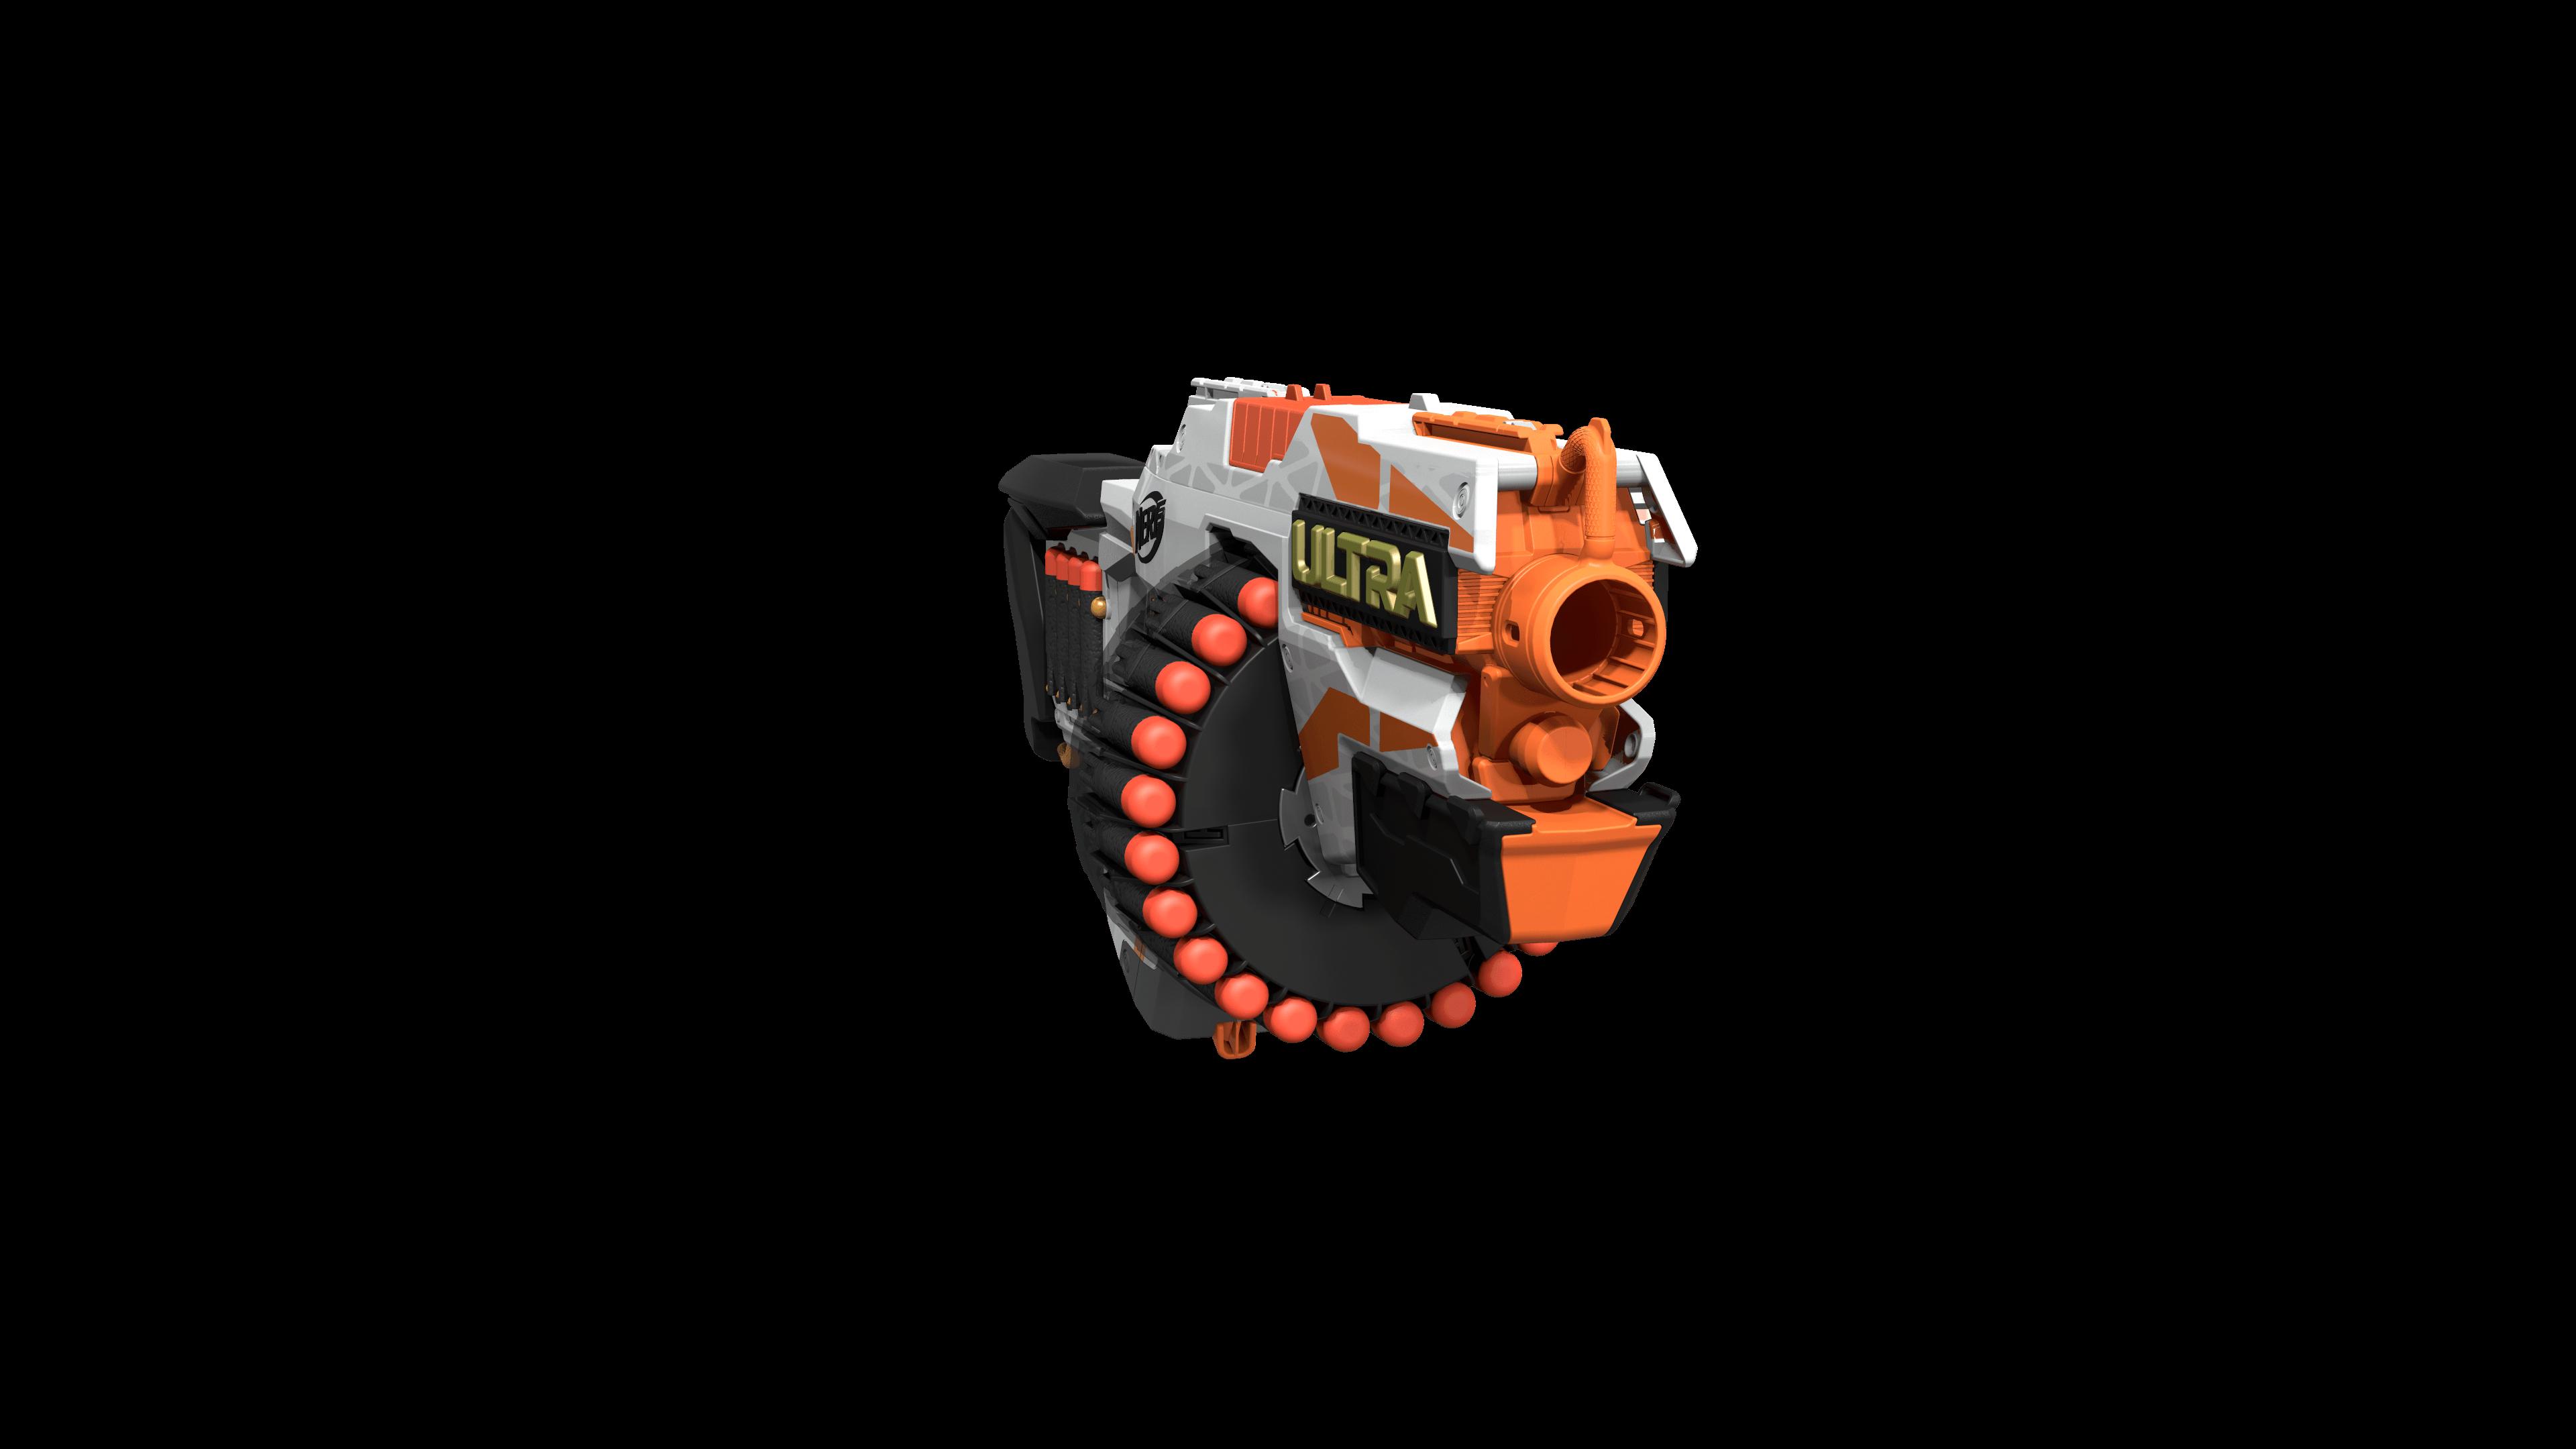 ultra blaster img 97